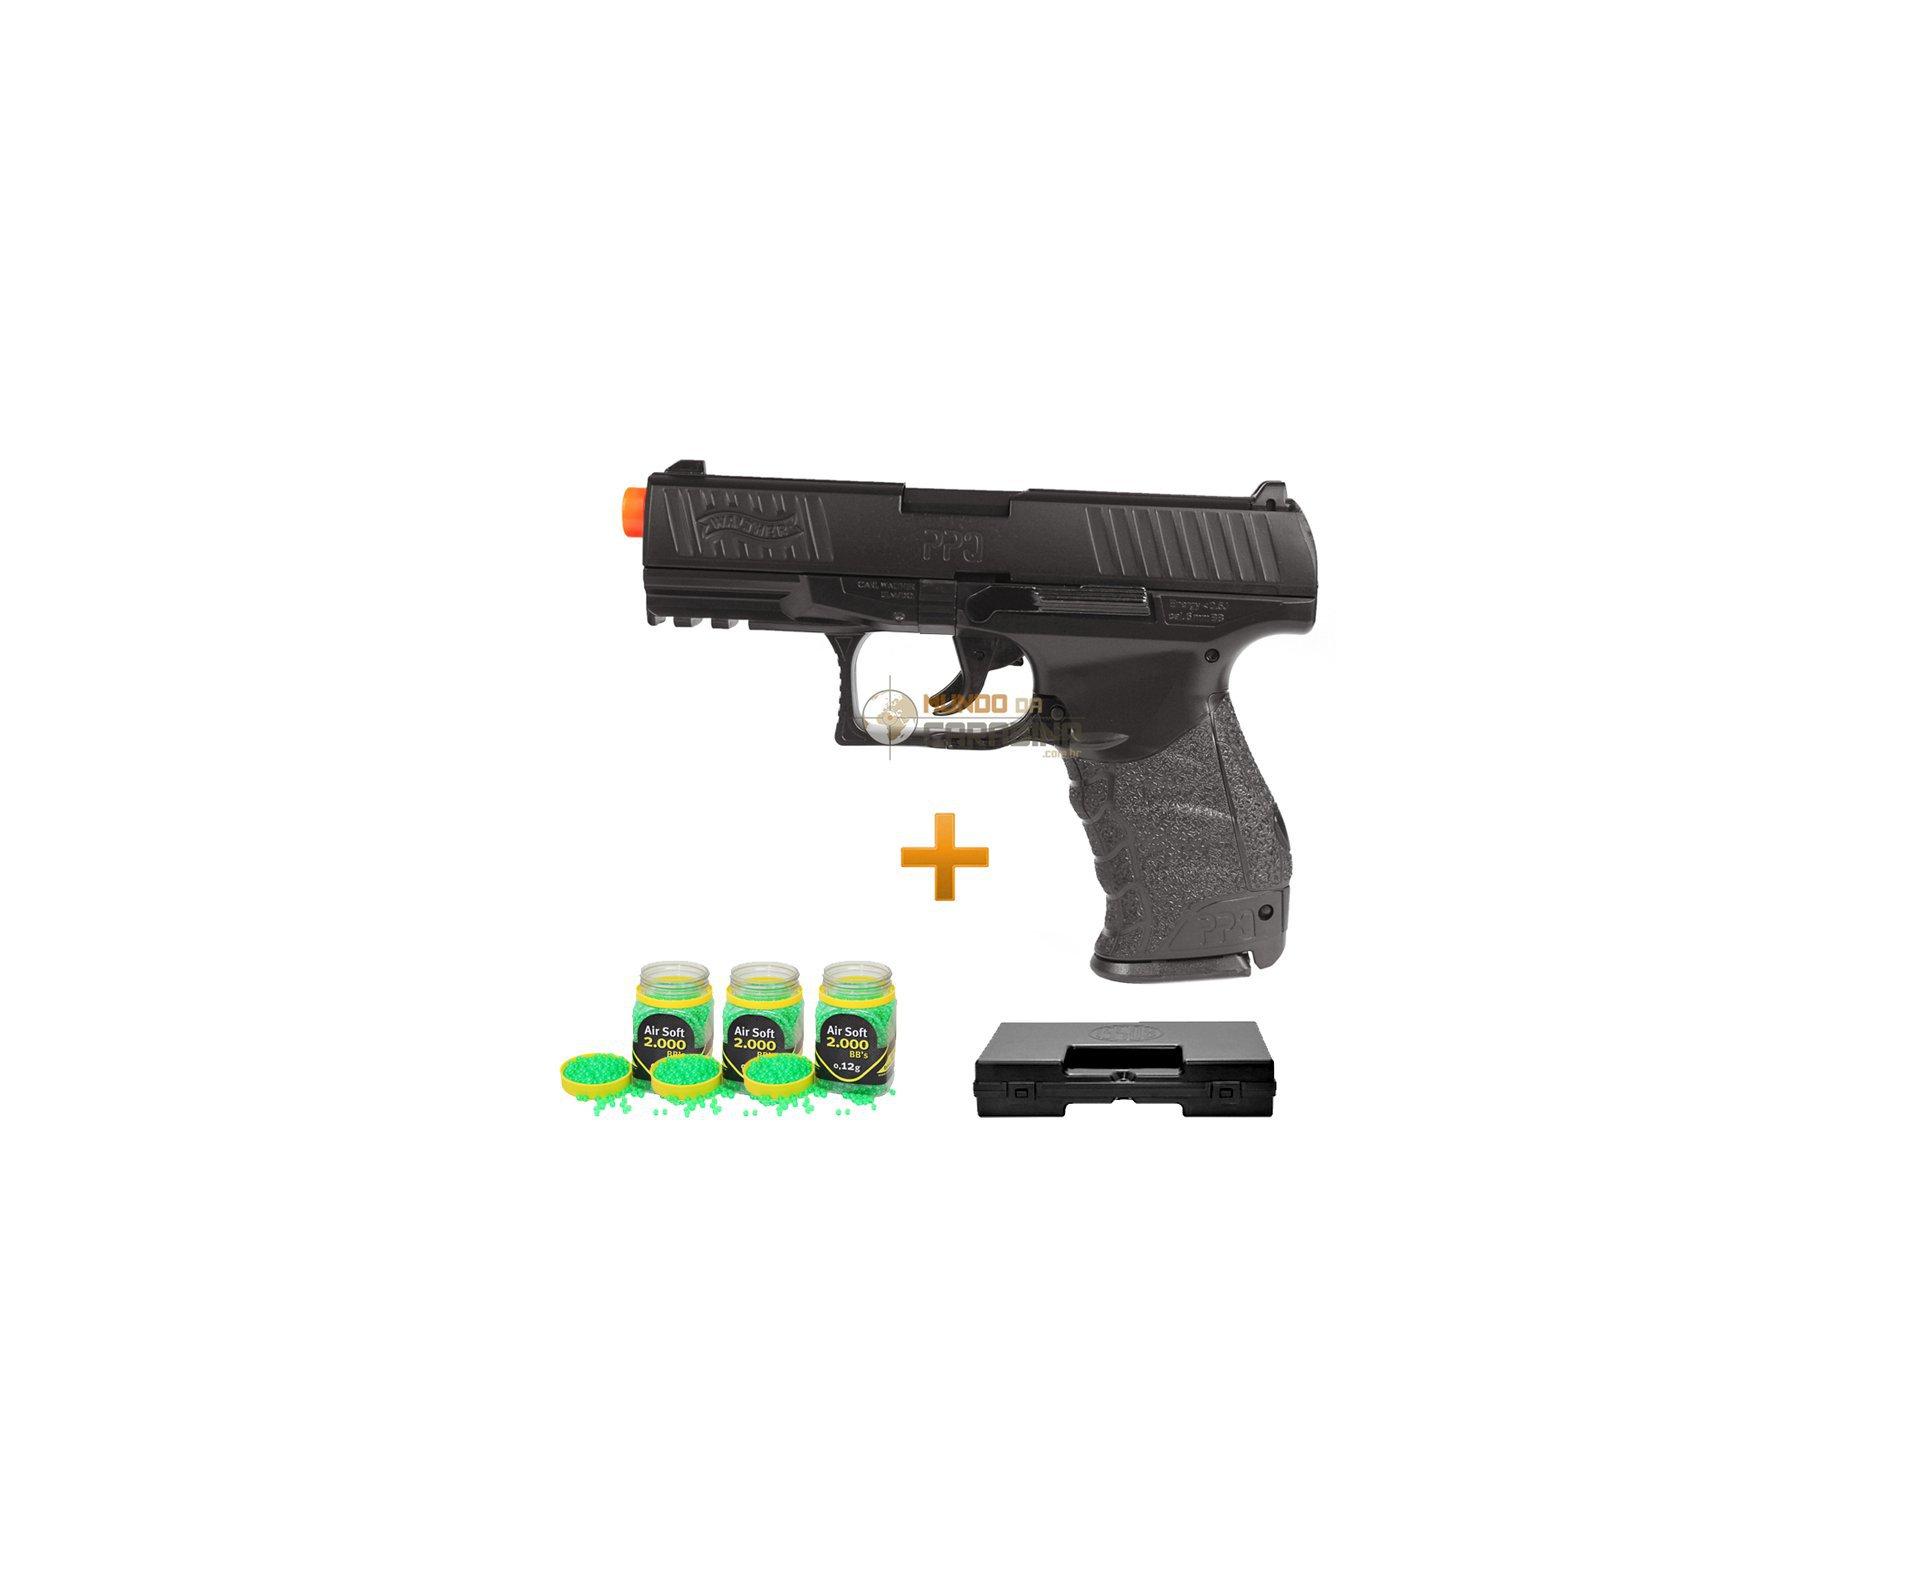 Pistola De Airsoft Walther Ppq Slide Metal - Cal 6mm + 6000 Esferas 0,12g + Case Deluxe